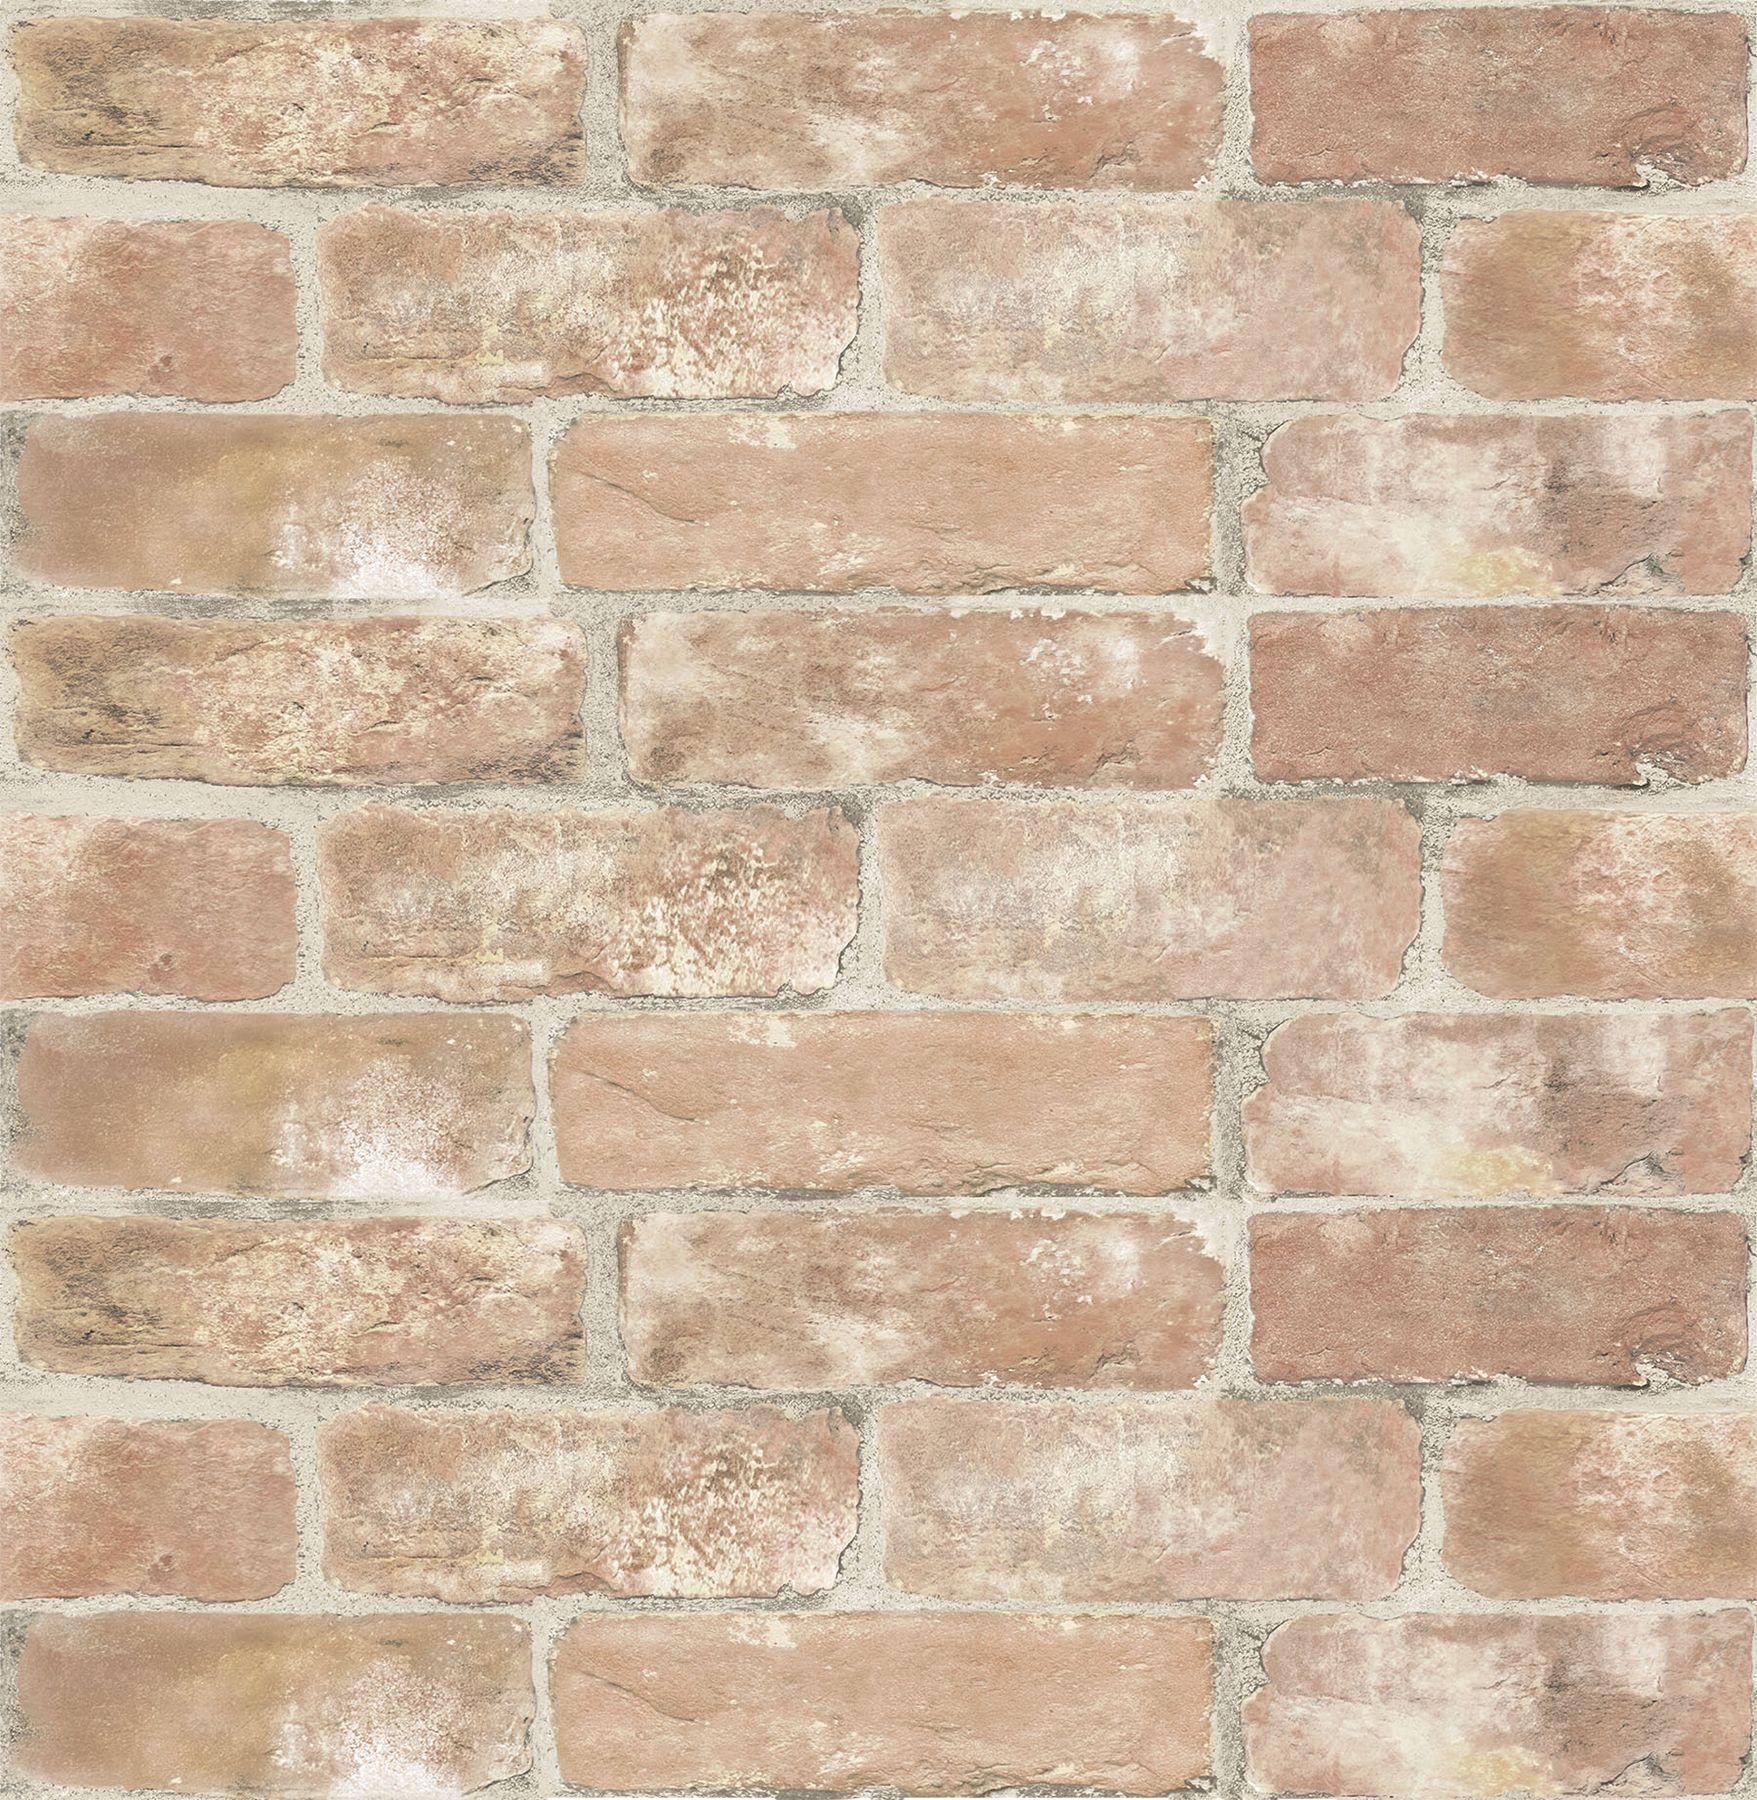 Inhome Old Town Brick Peel Stick Wallpaper Walmart Com In 2020 Brick Wallpaper Peel And Stick Wallpaper Red Brick Wallpaper